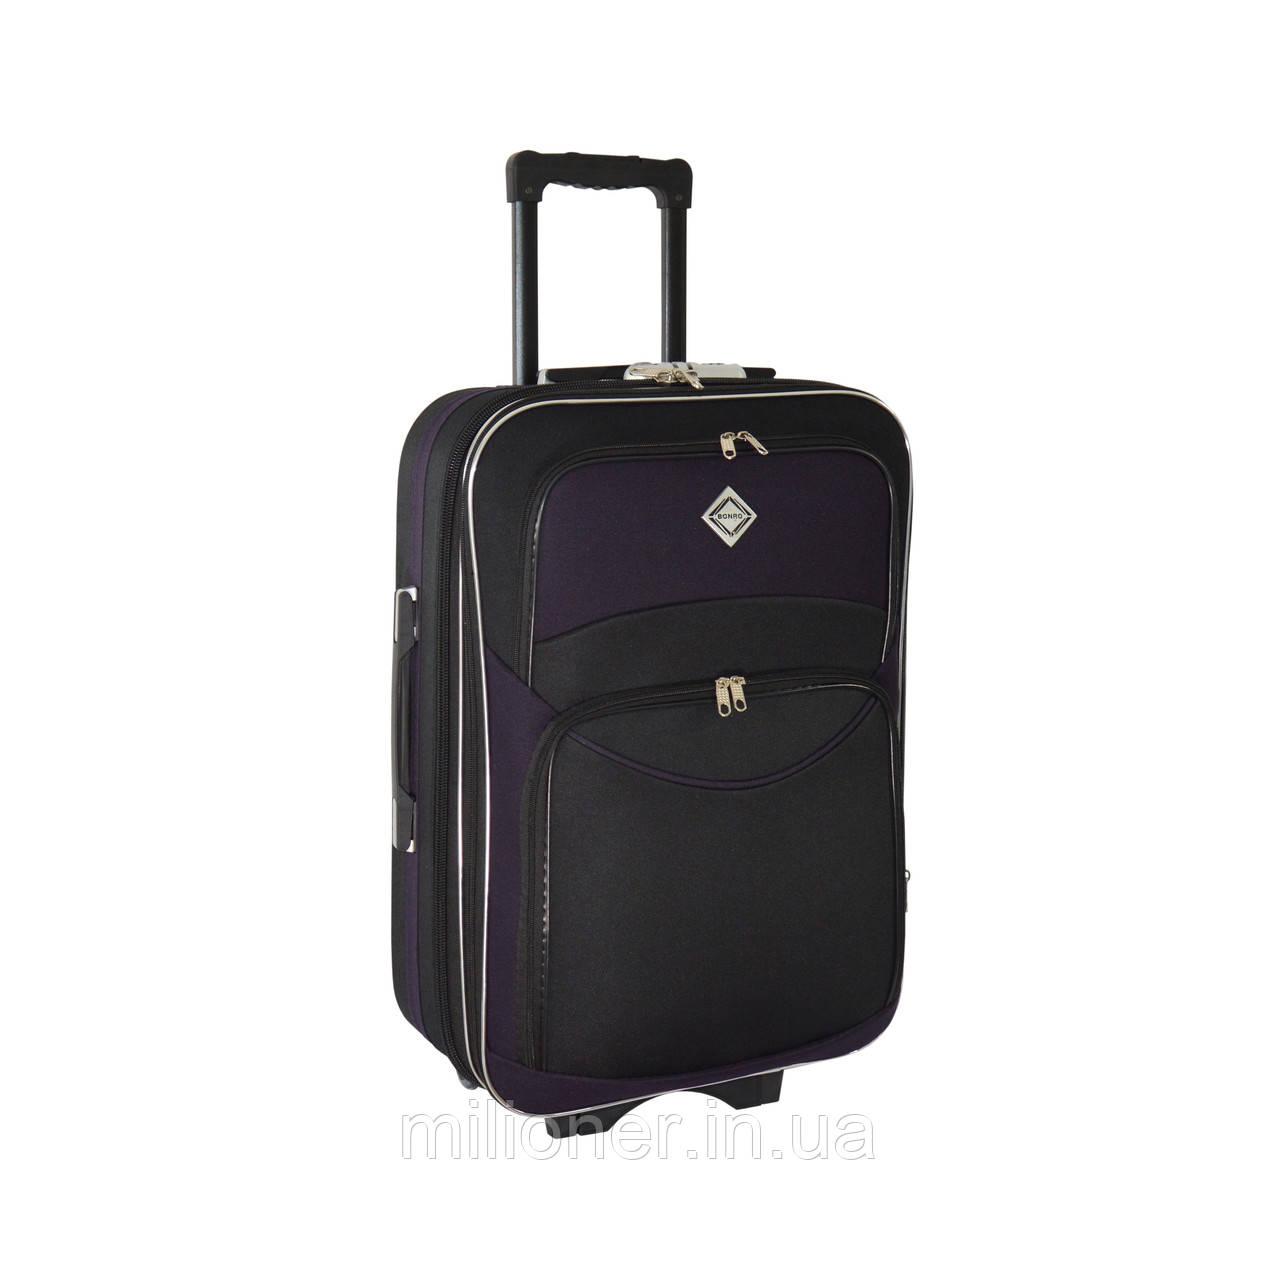 Чемодан Bonro Style (средний) черно-т. фиолетовый